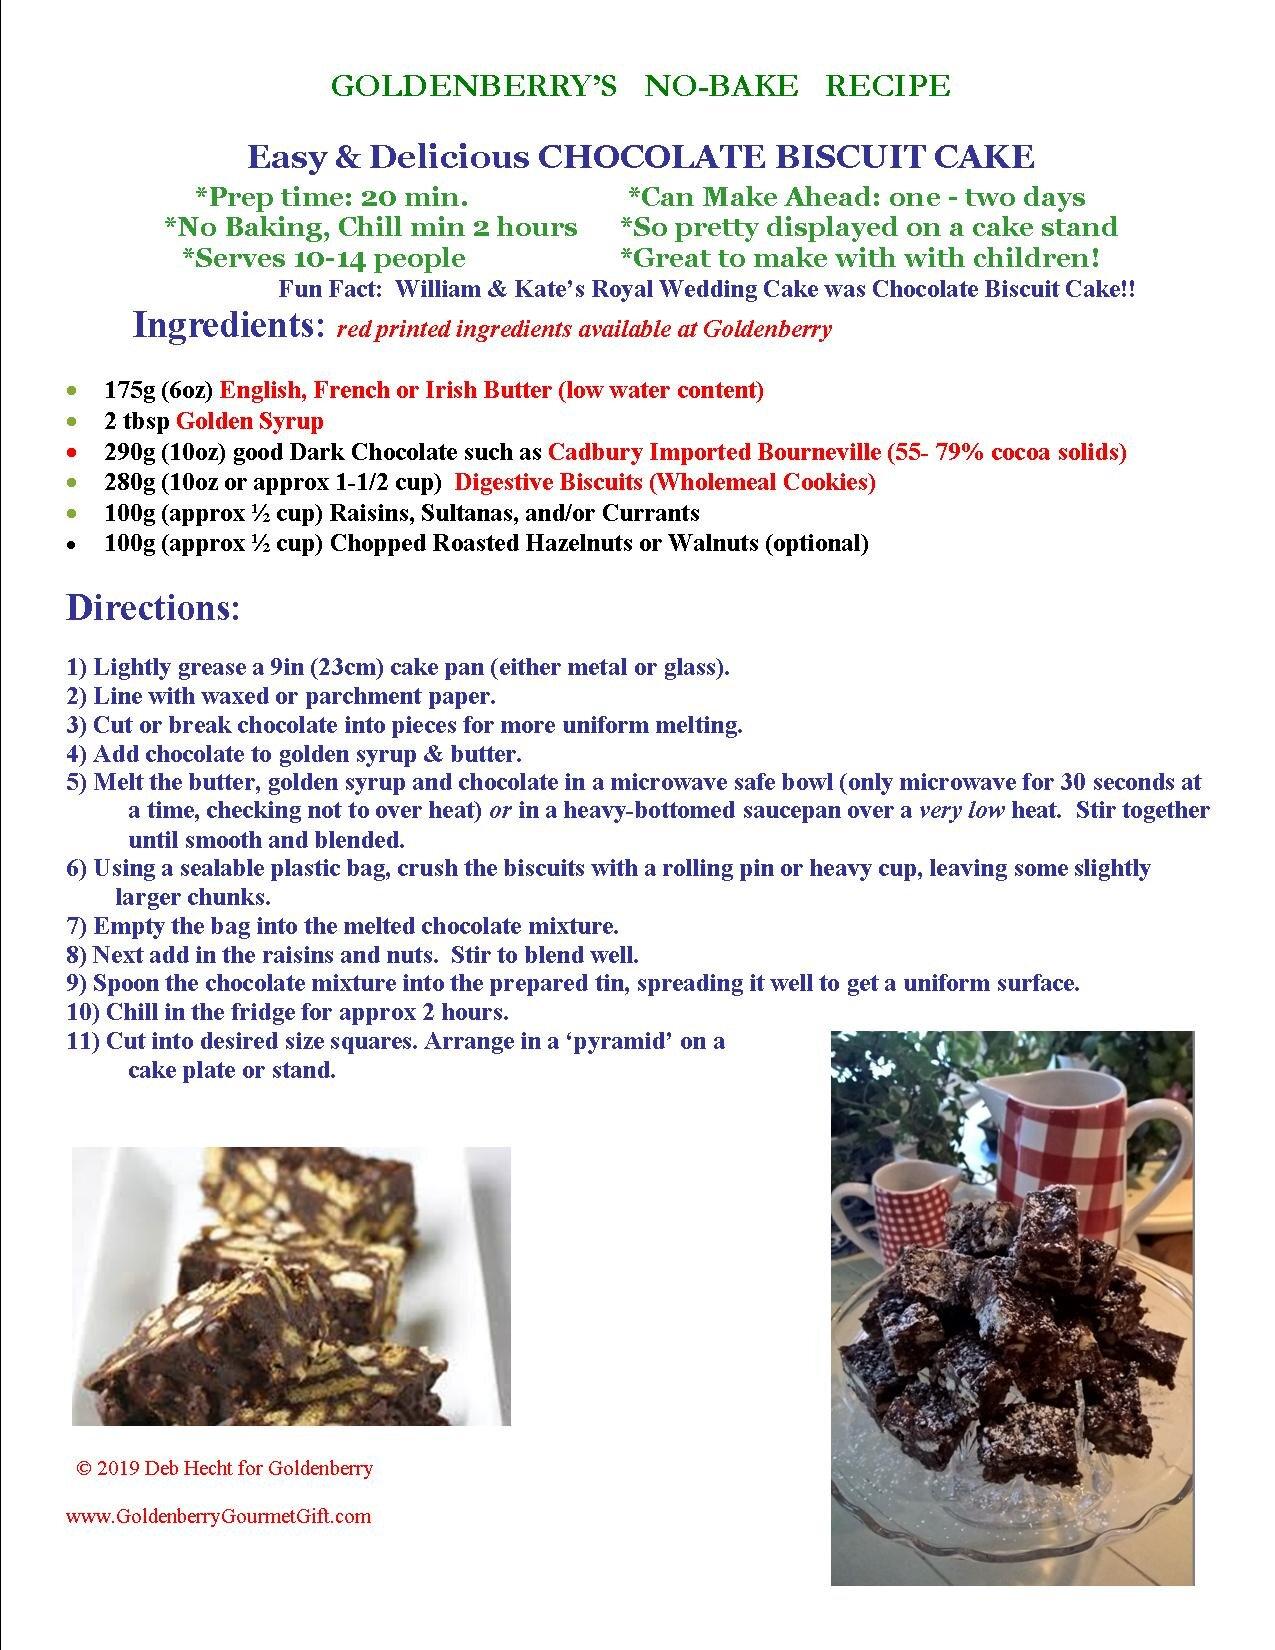 Chocolate Biscuit cake 2b.jpg